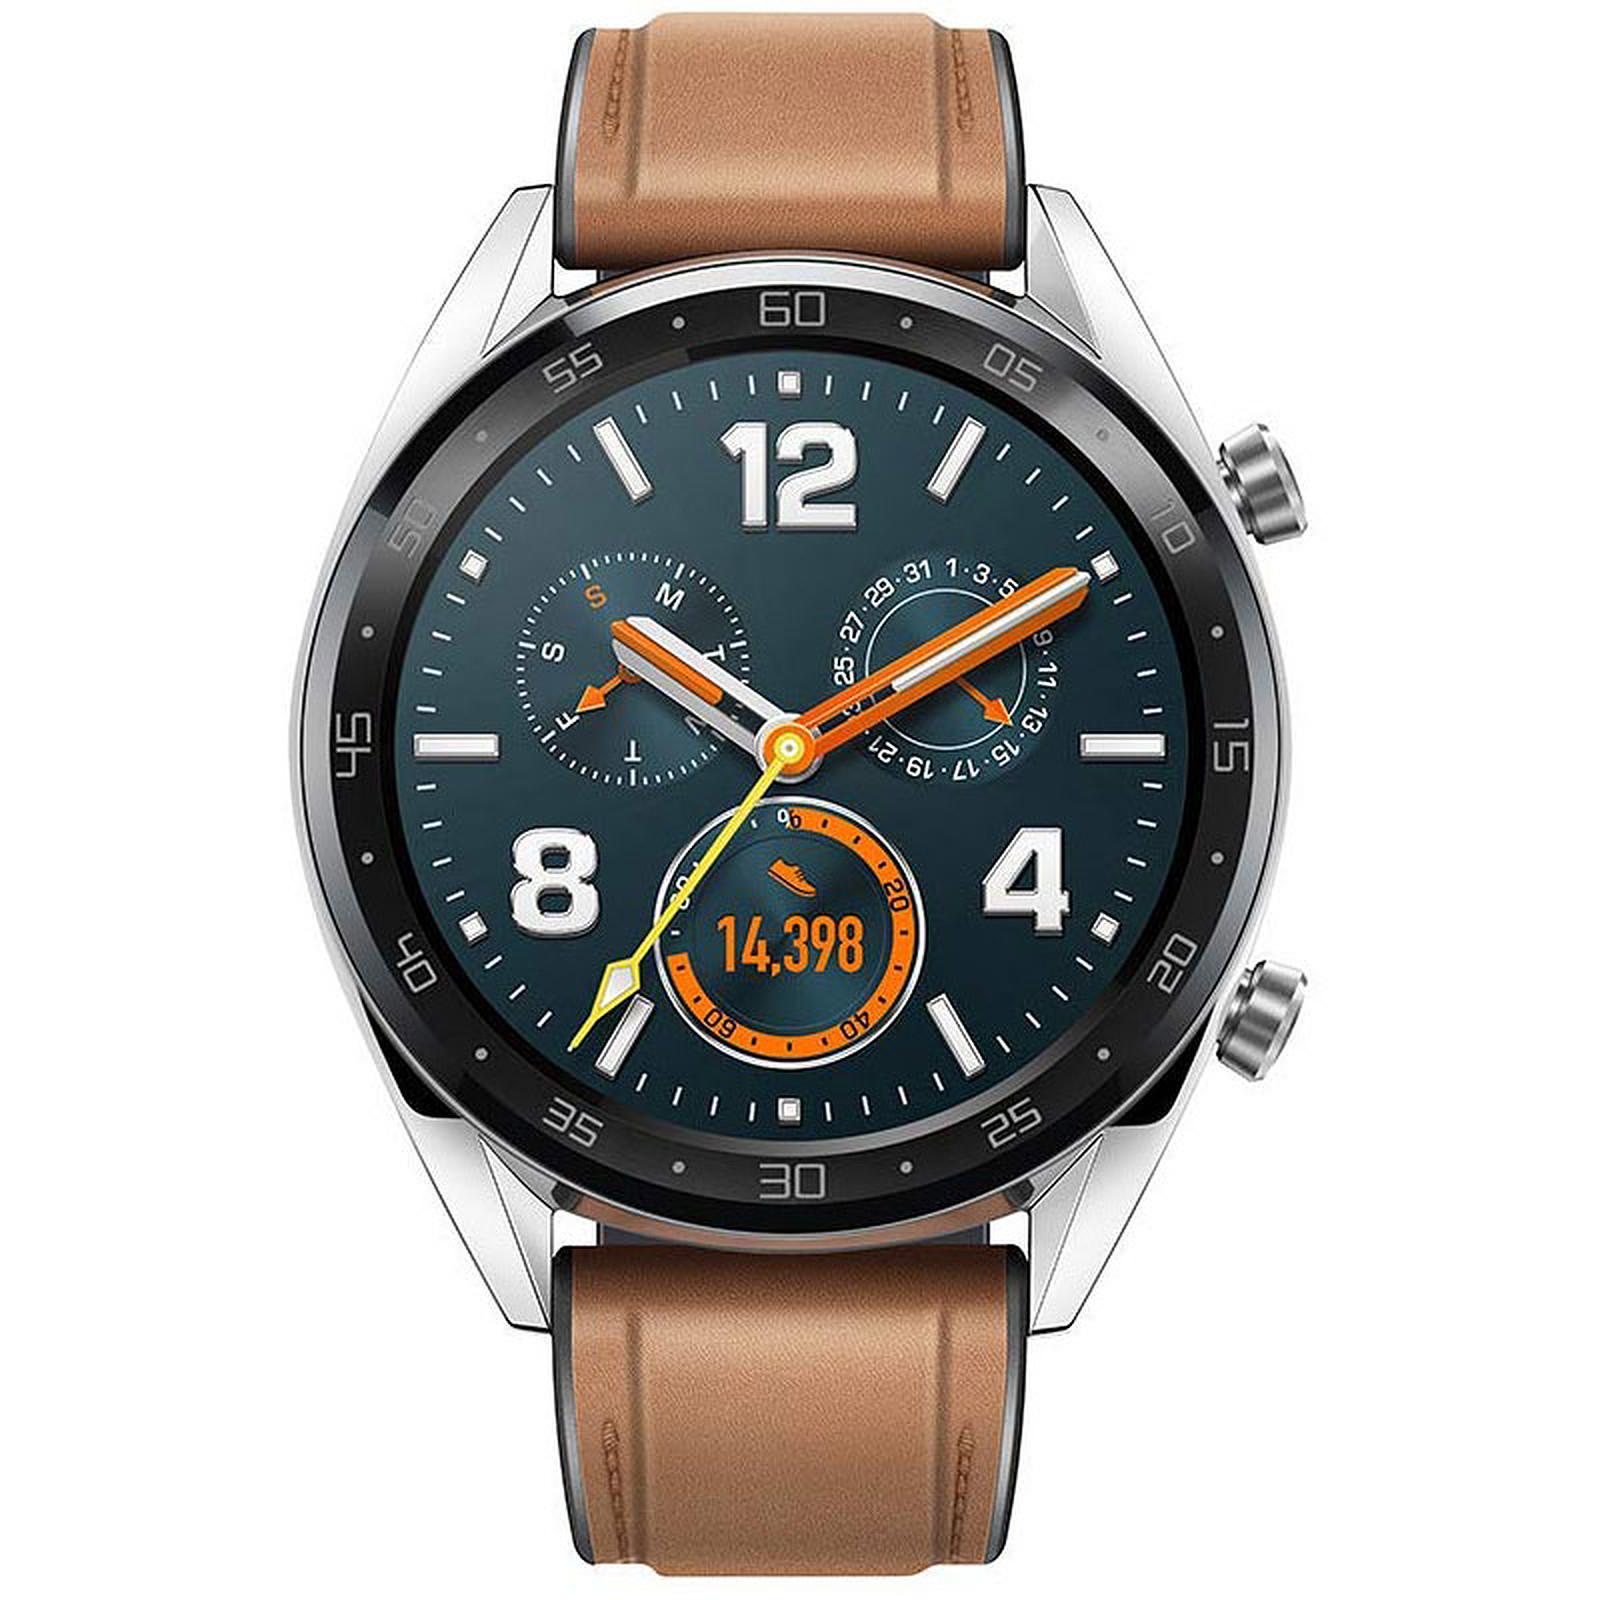 Montre connectée Huawei Watch GT - Boitier 46 mm (89€26 avec code promo)